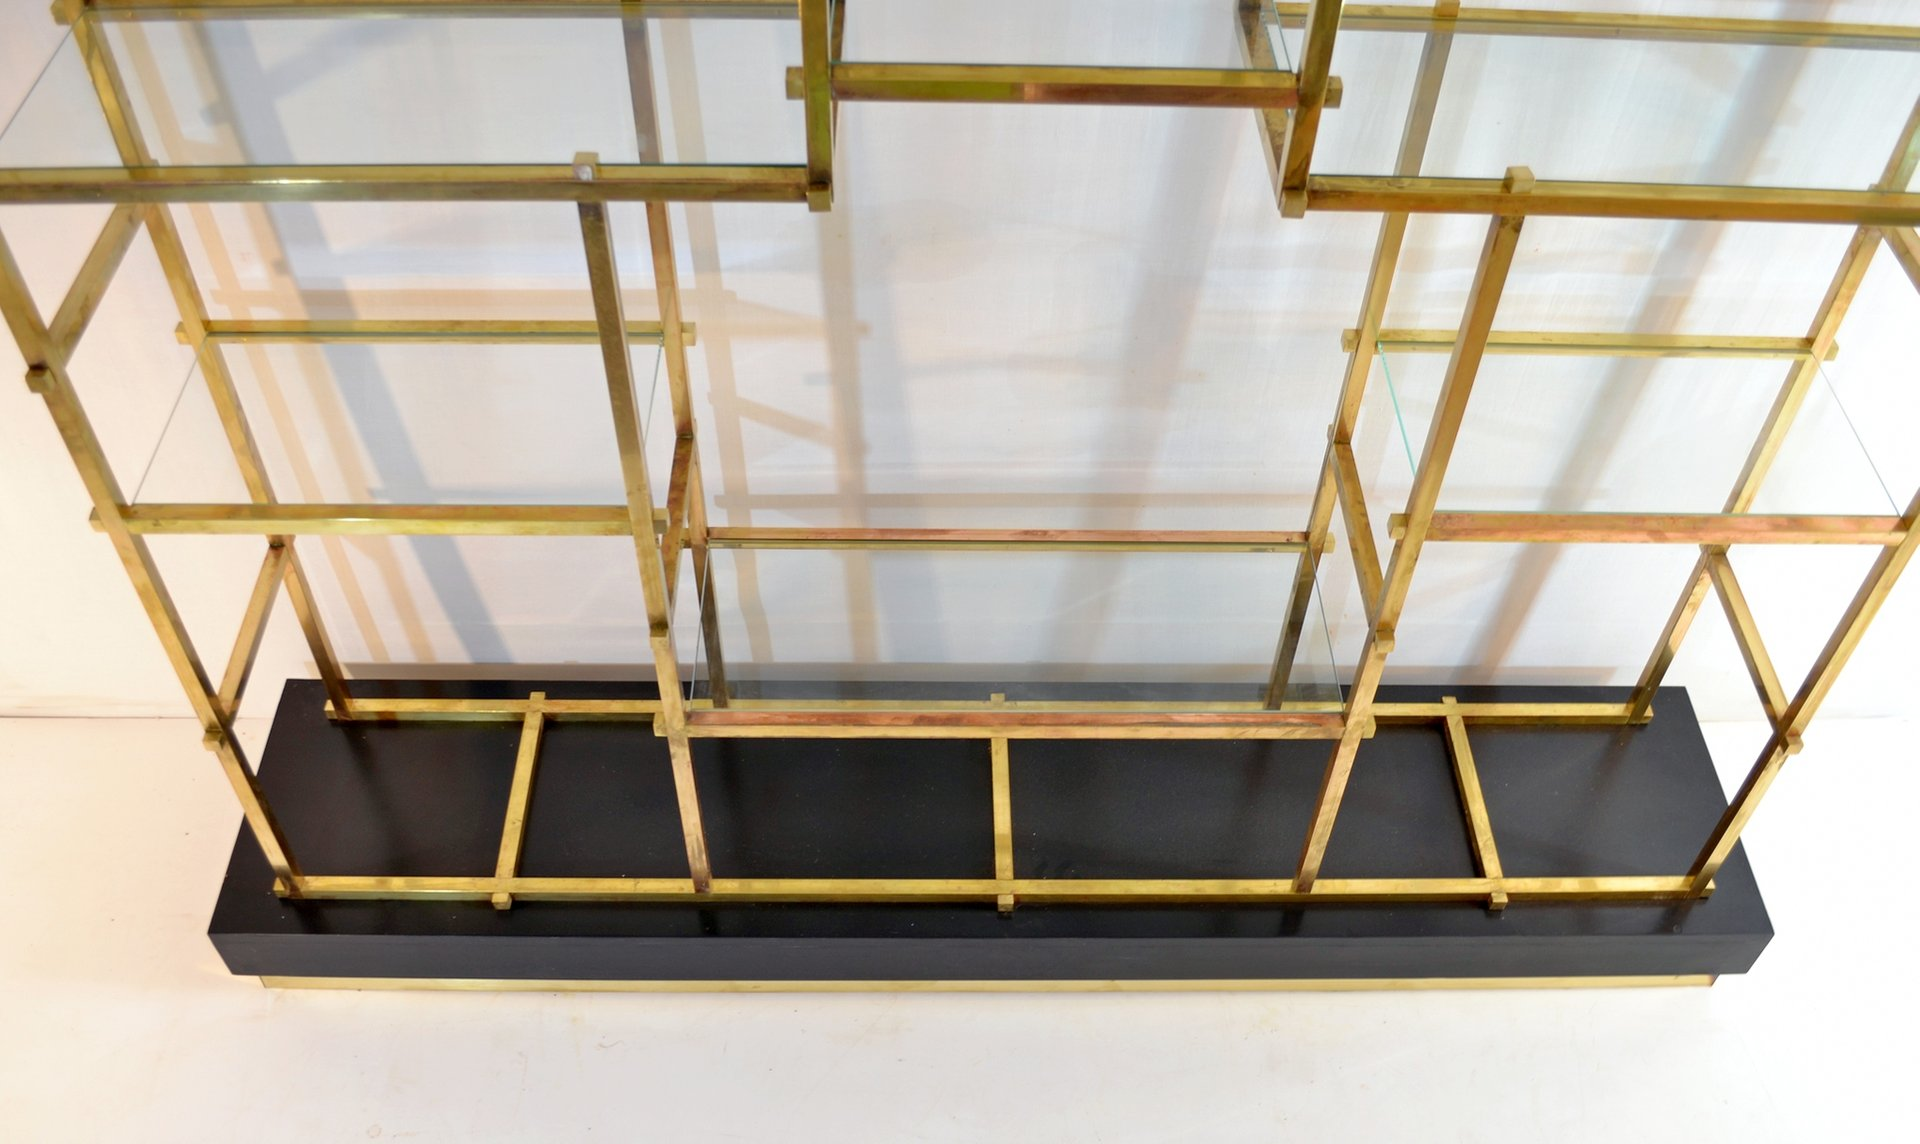 gro es messing regal von romeo rega 1970er bei pamono kaufen. Black Bedroom Furniture Sets. Home Design Ideas